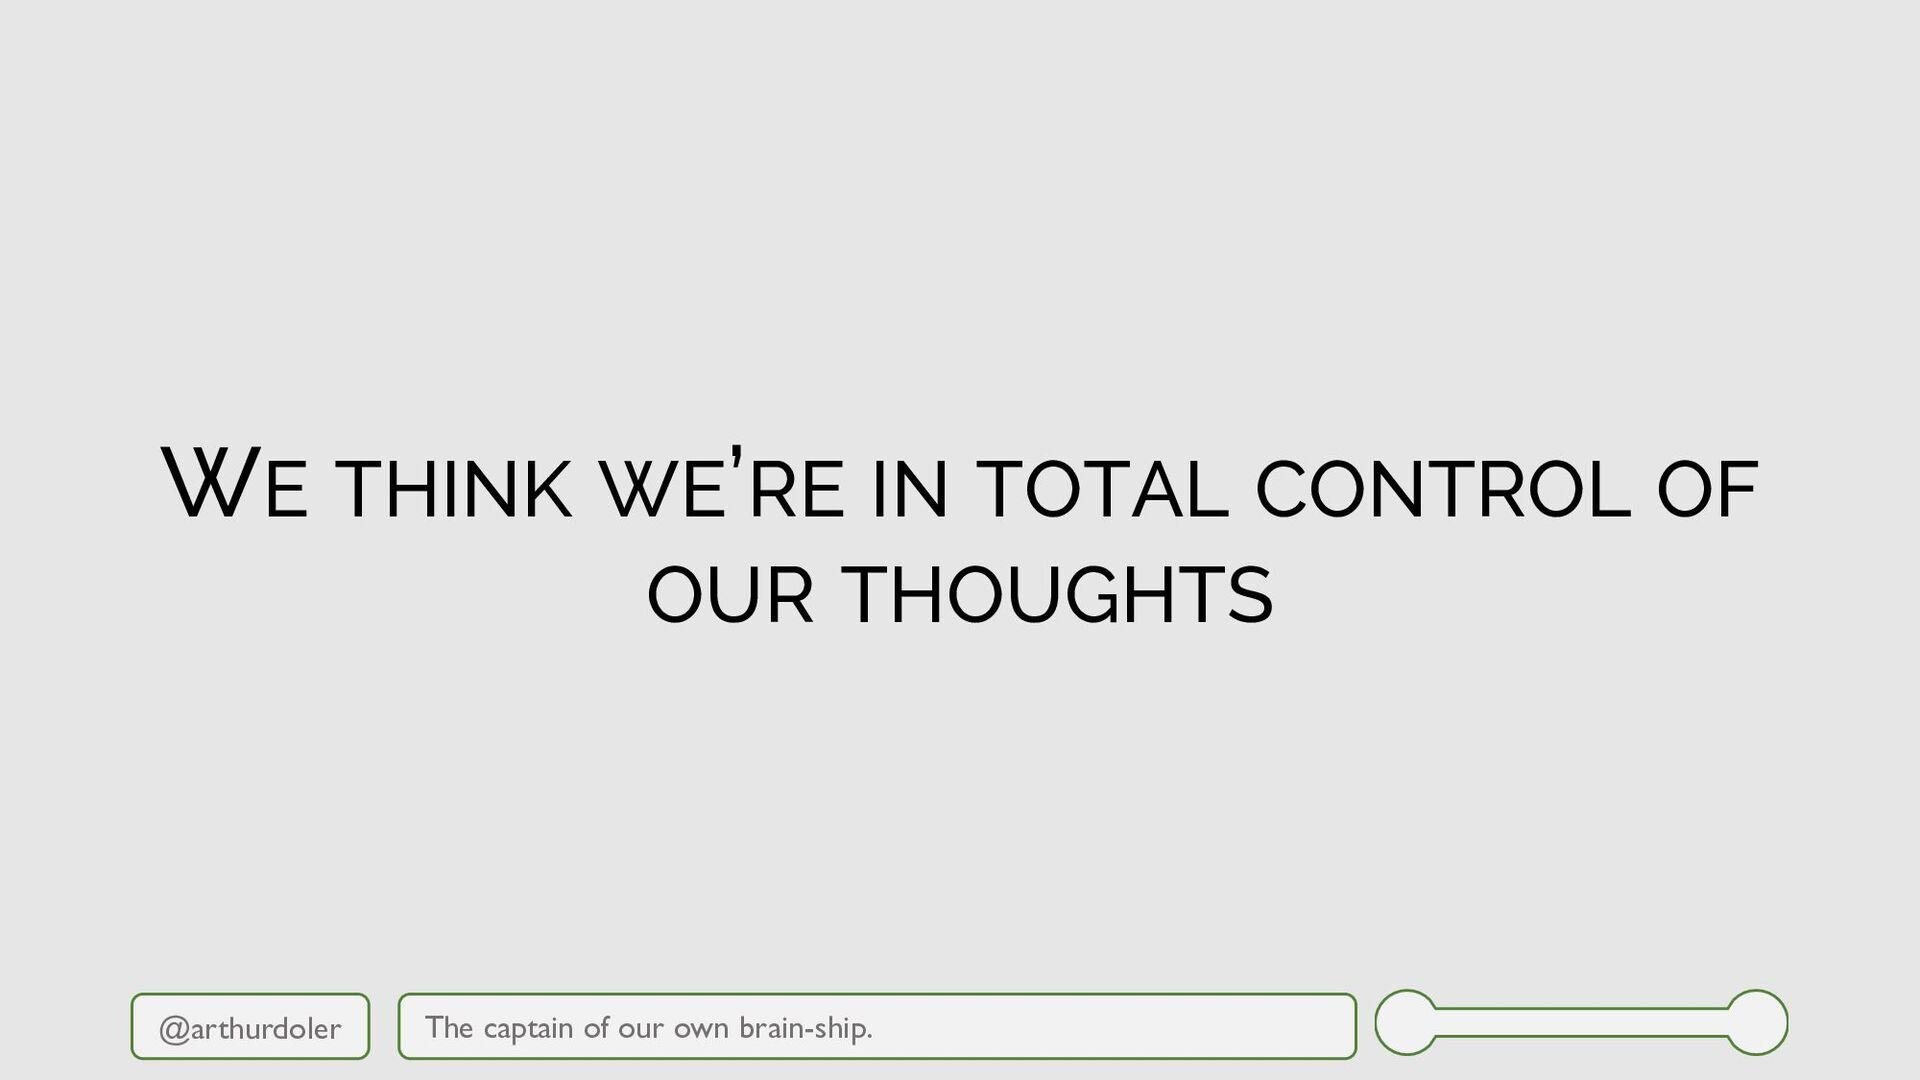 @arthurdoler WE THINK WE'RE IN TOTAL CONTROL OF...